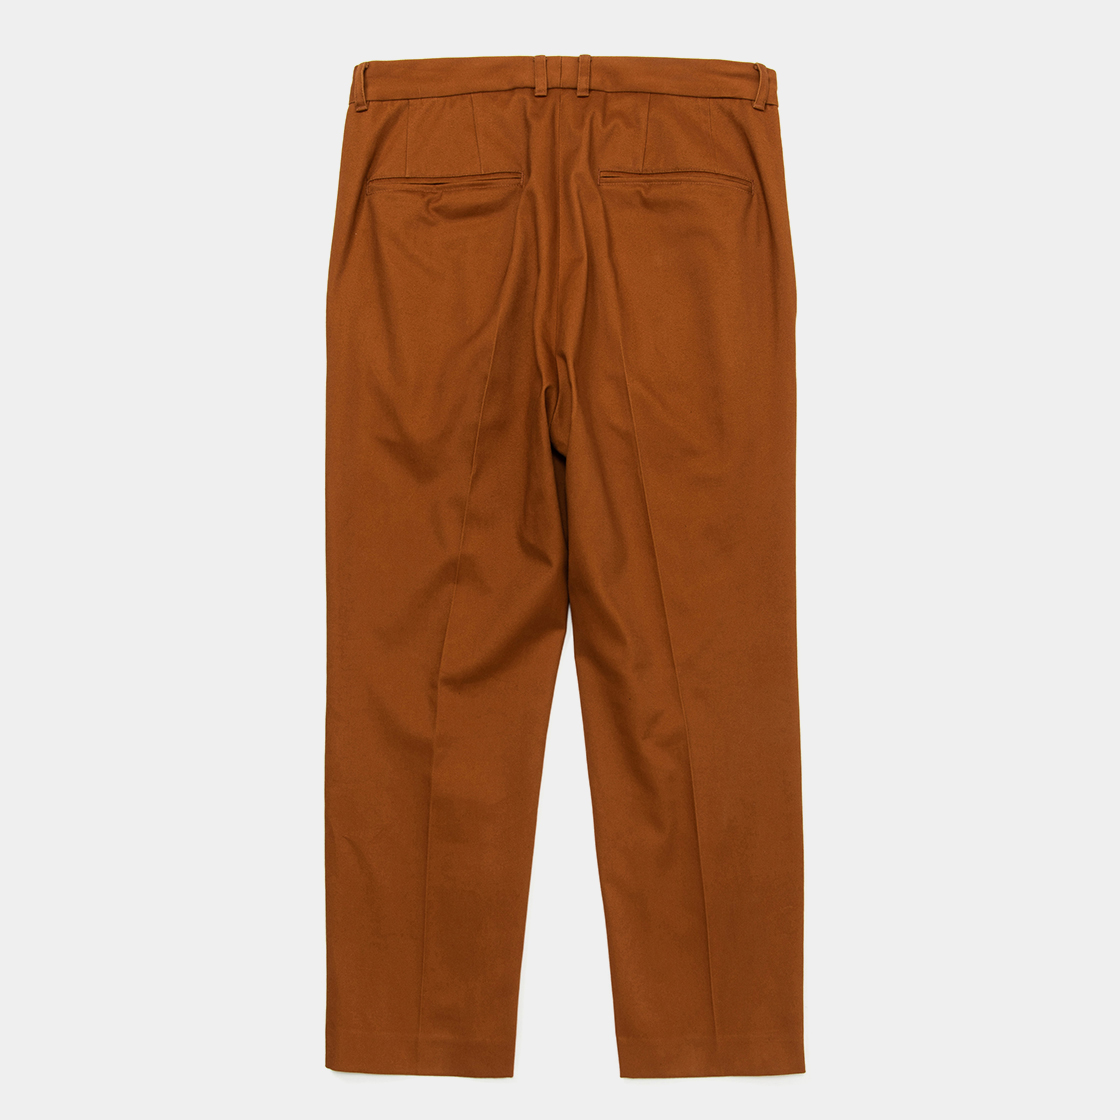 Satin Flannel Blur Trouser / Brown